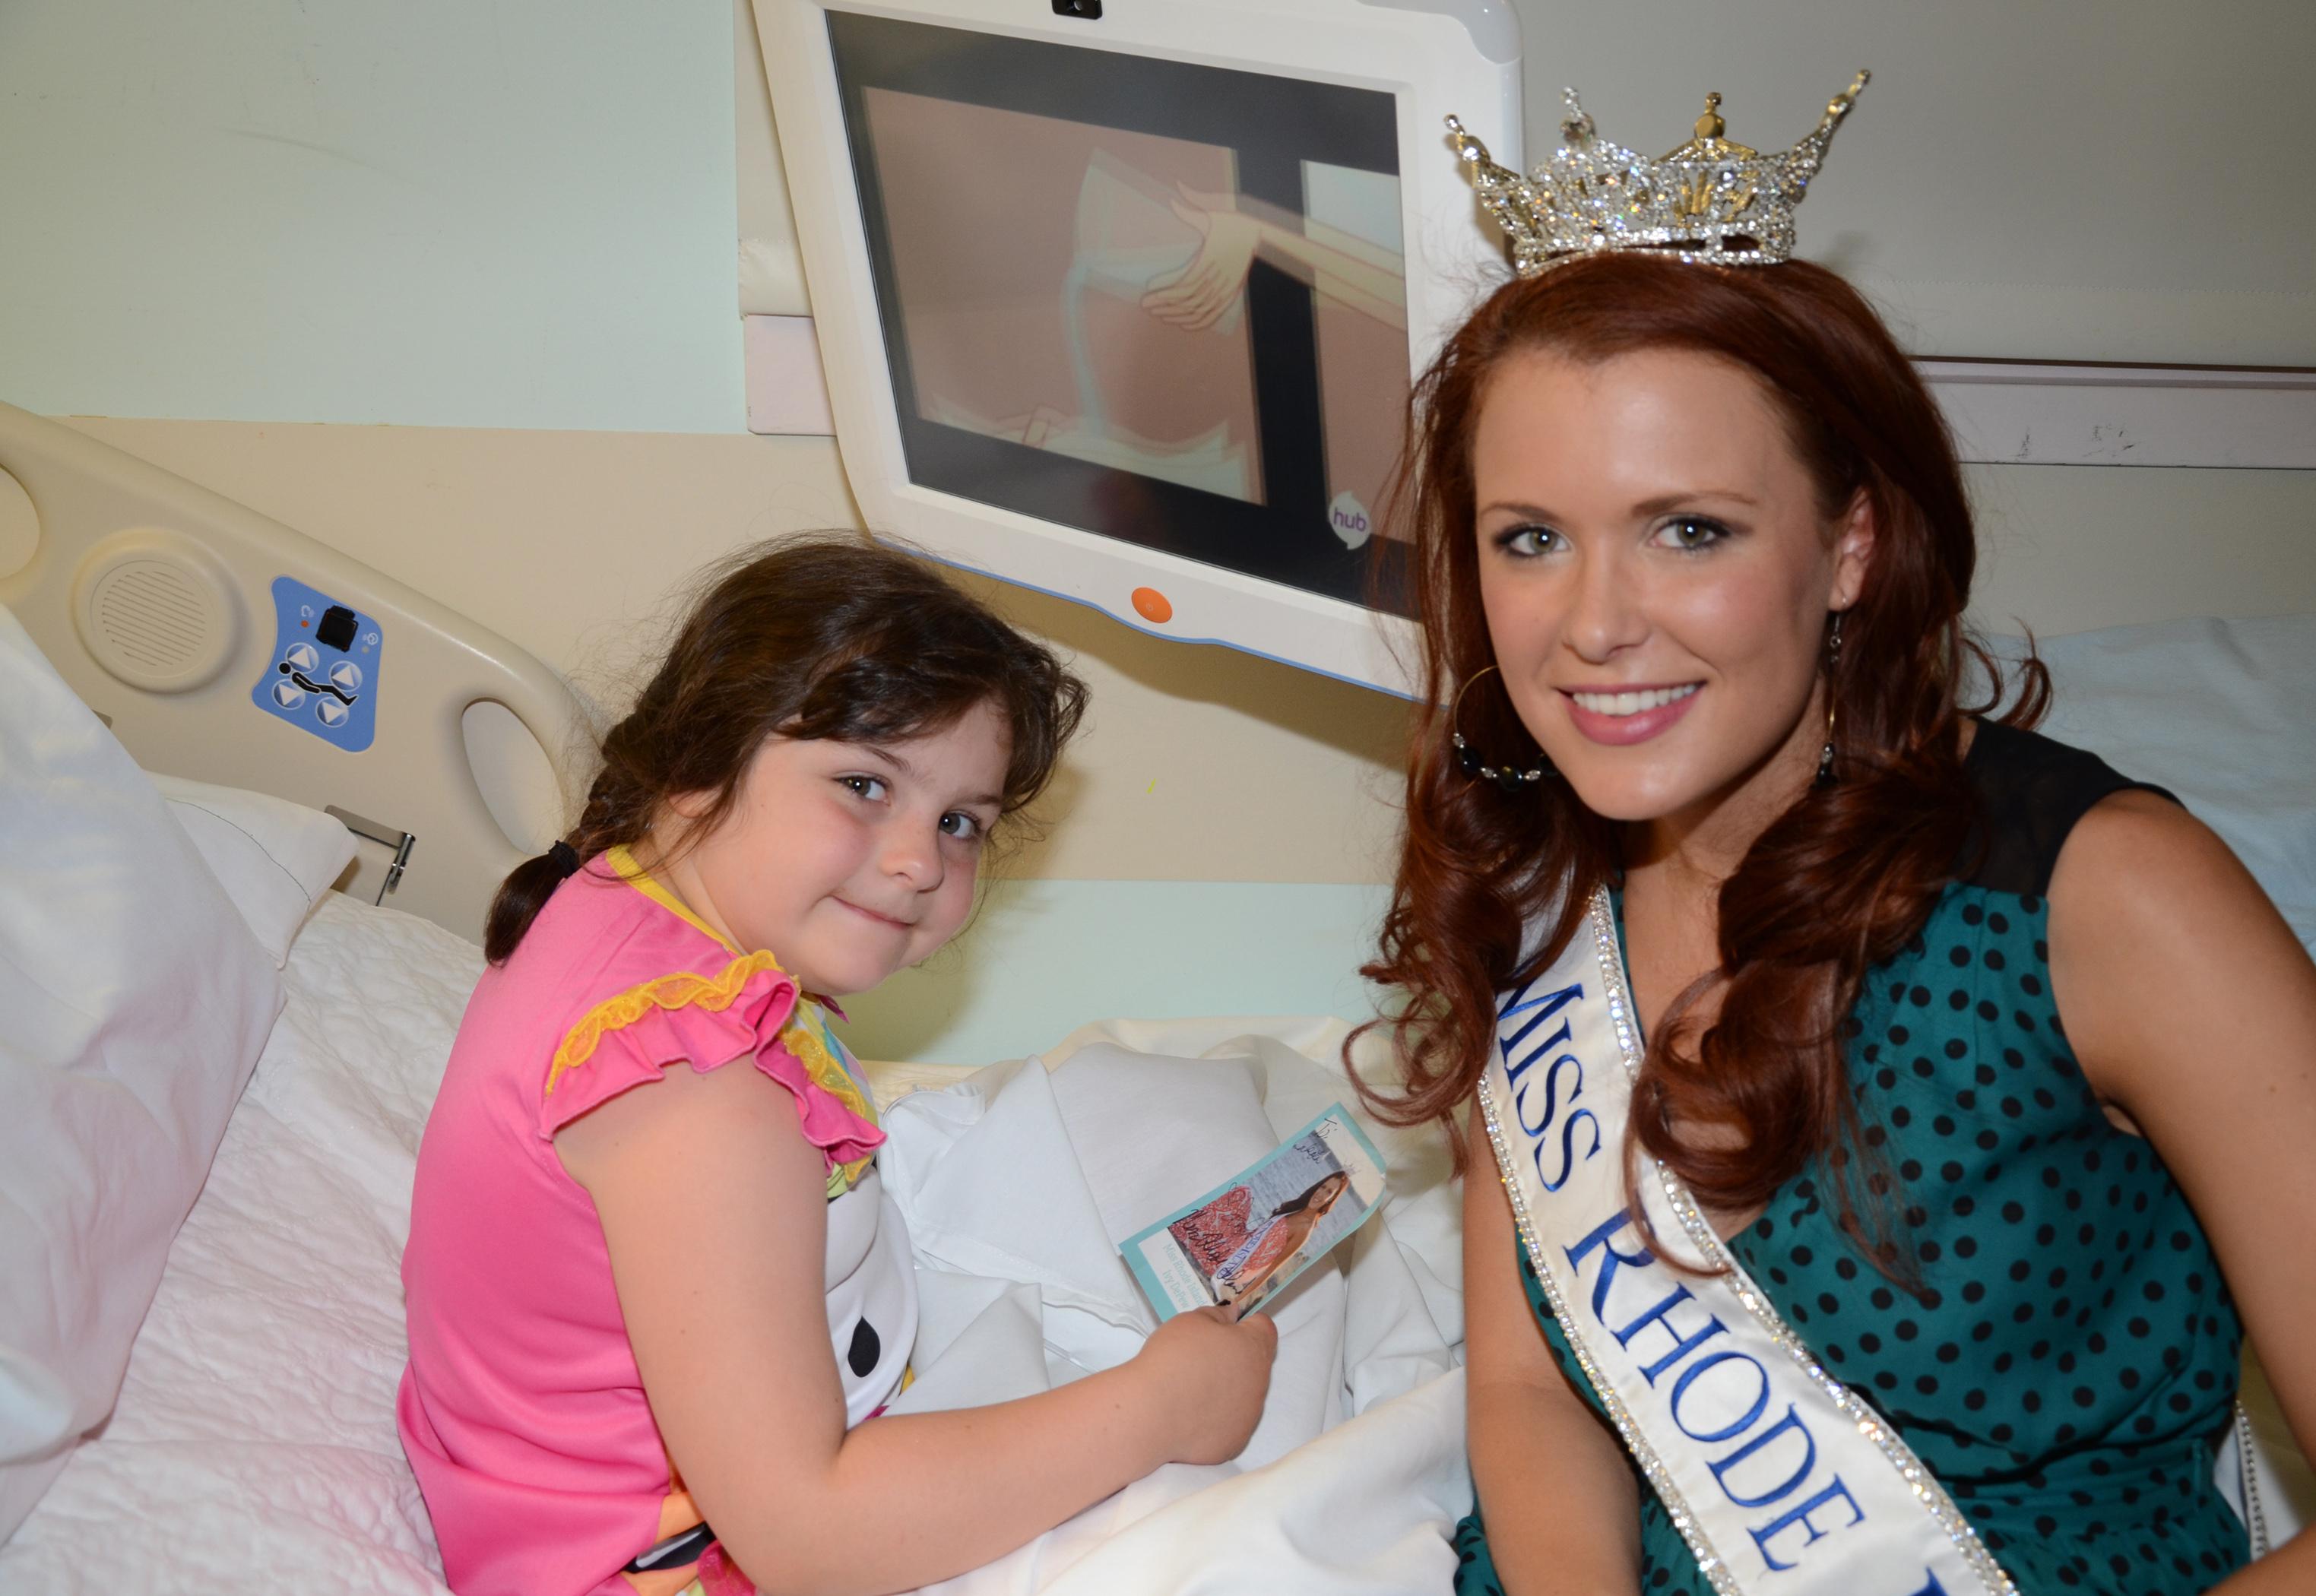 Miss Rhode Island, Ivy DePew